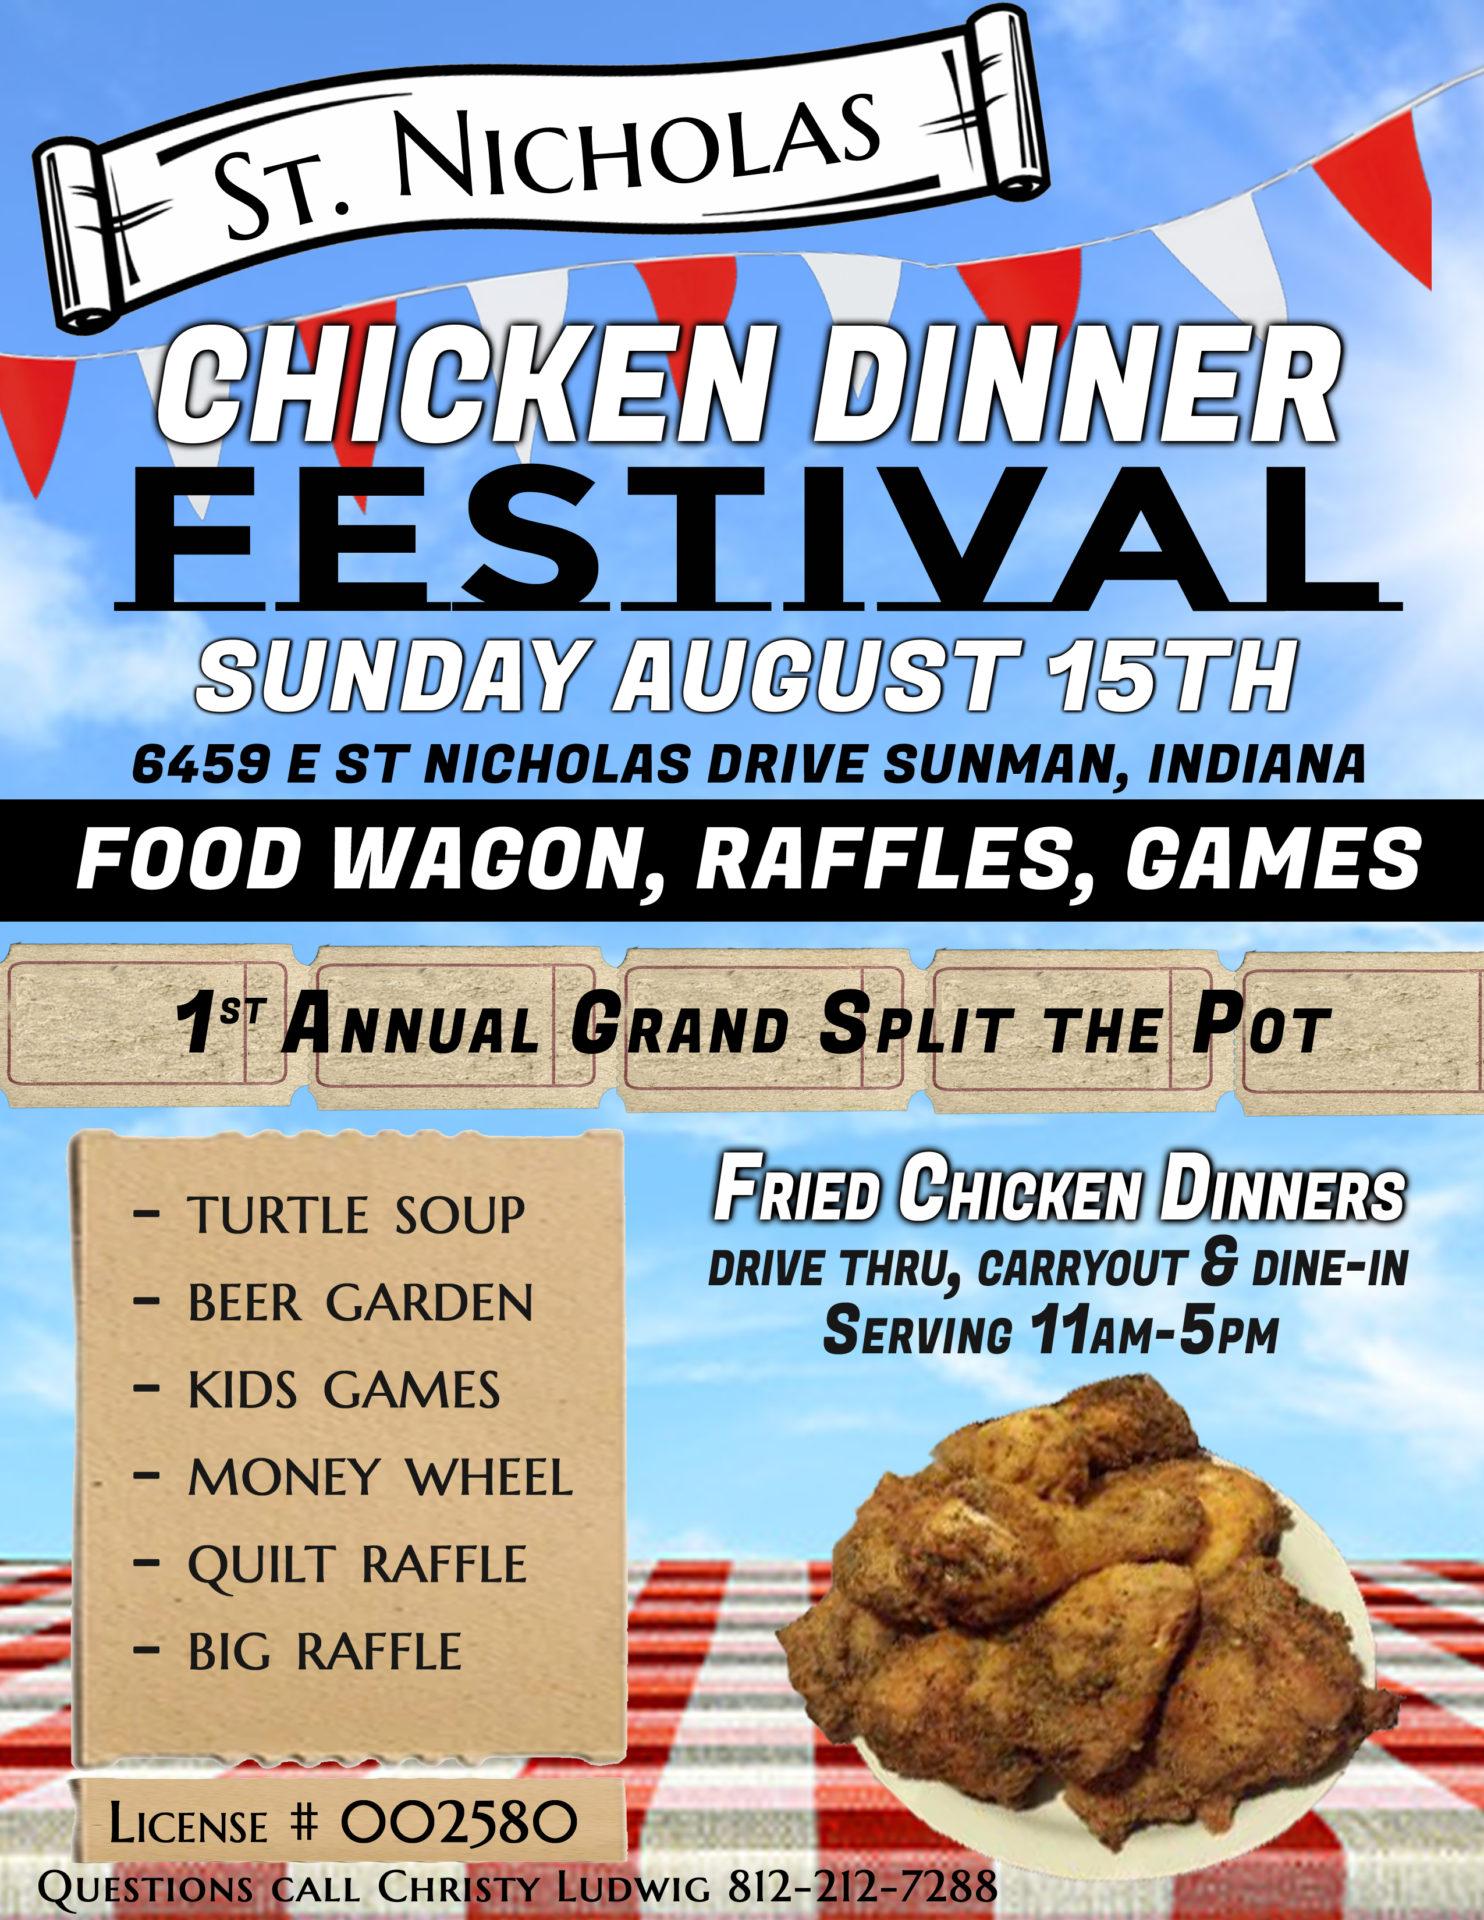 St Nicholas Chicken dinner festival